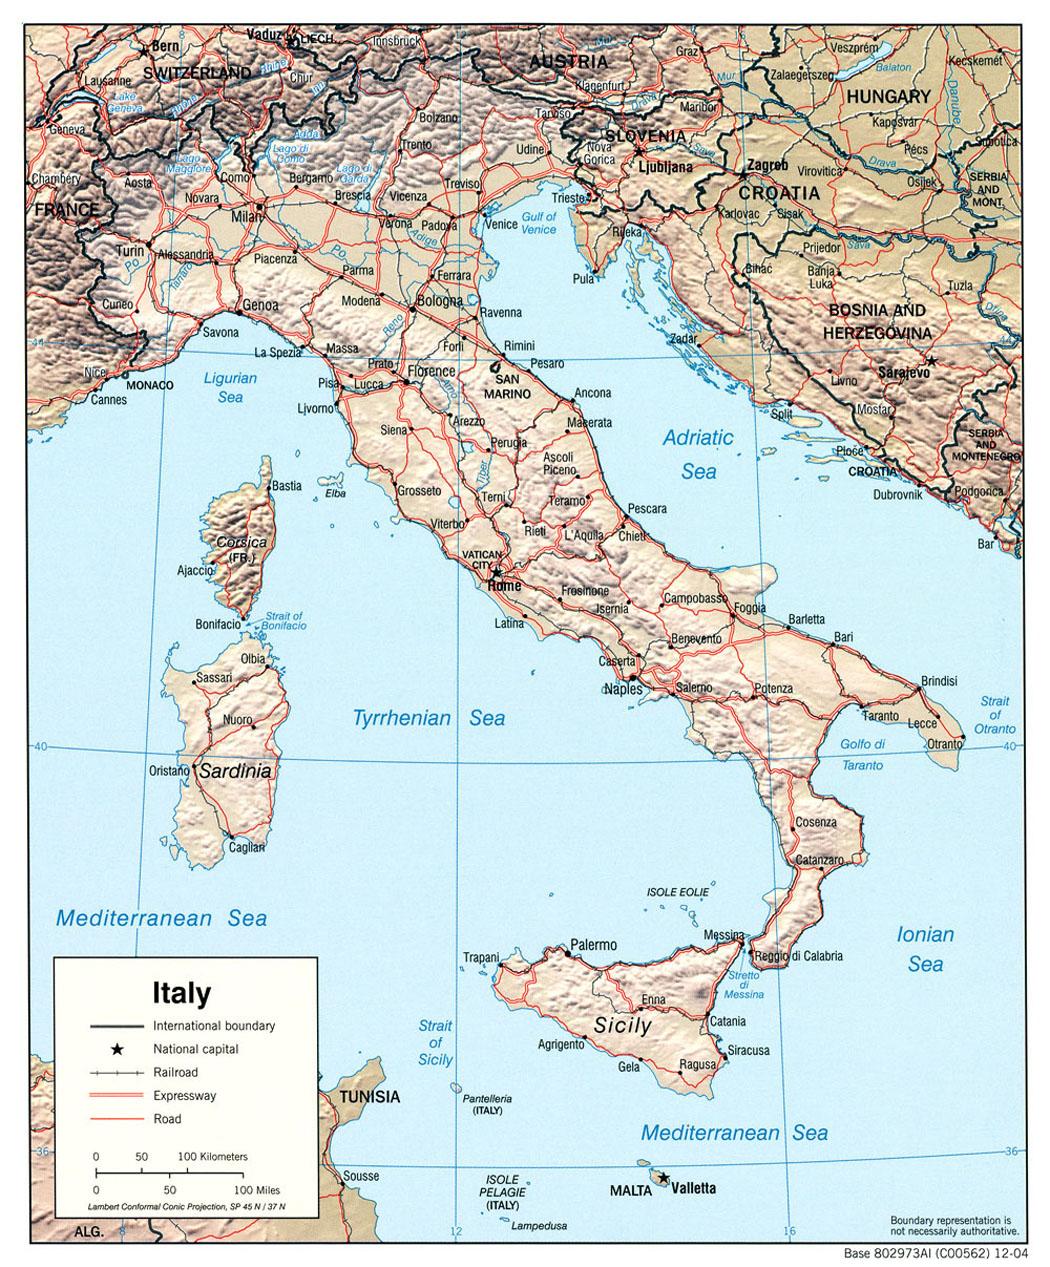 Cartes d'Italie - Carte-monde.org